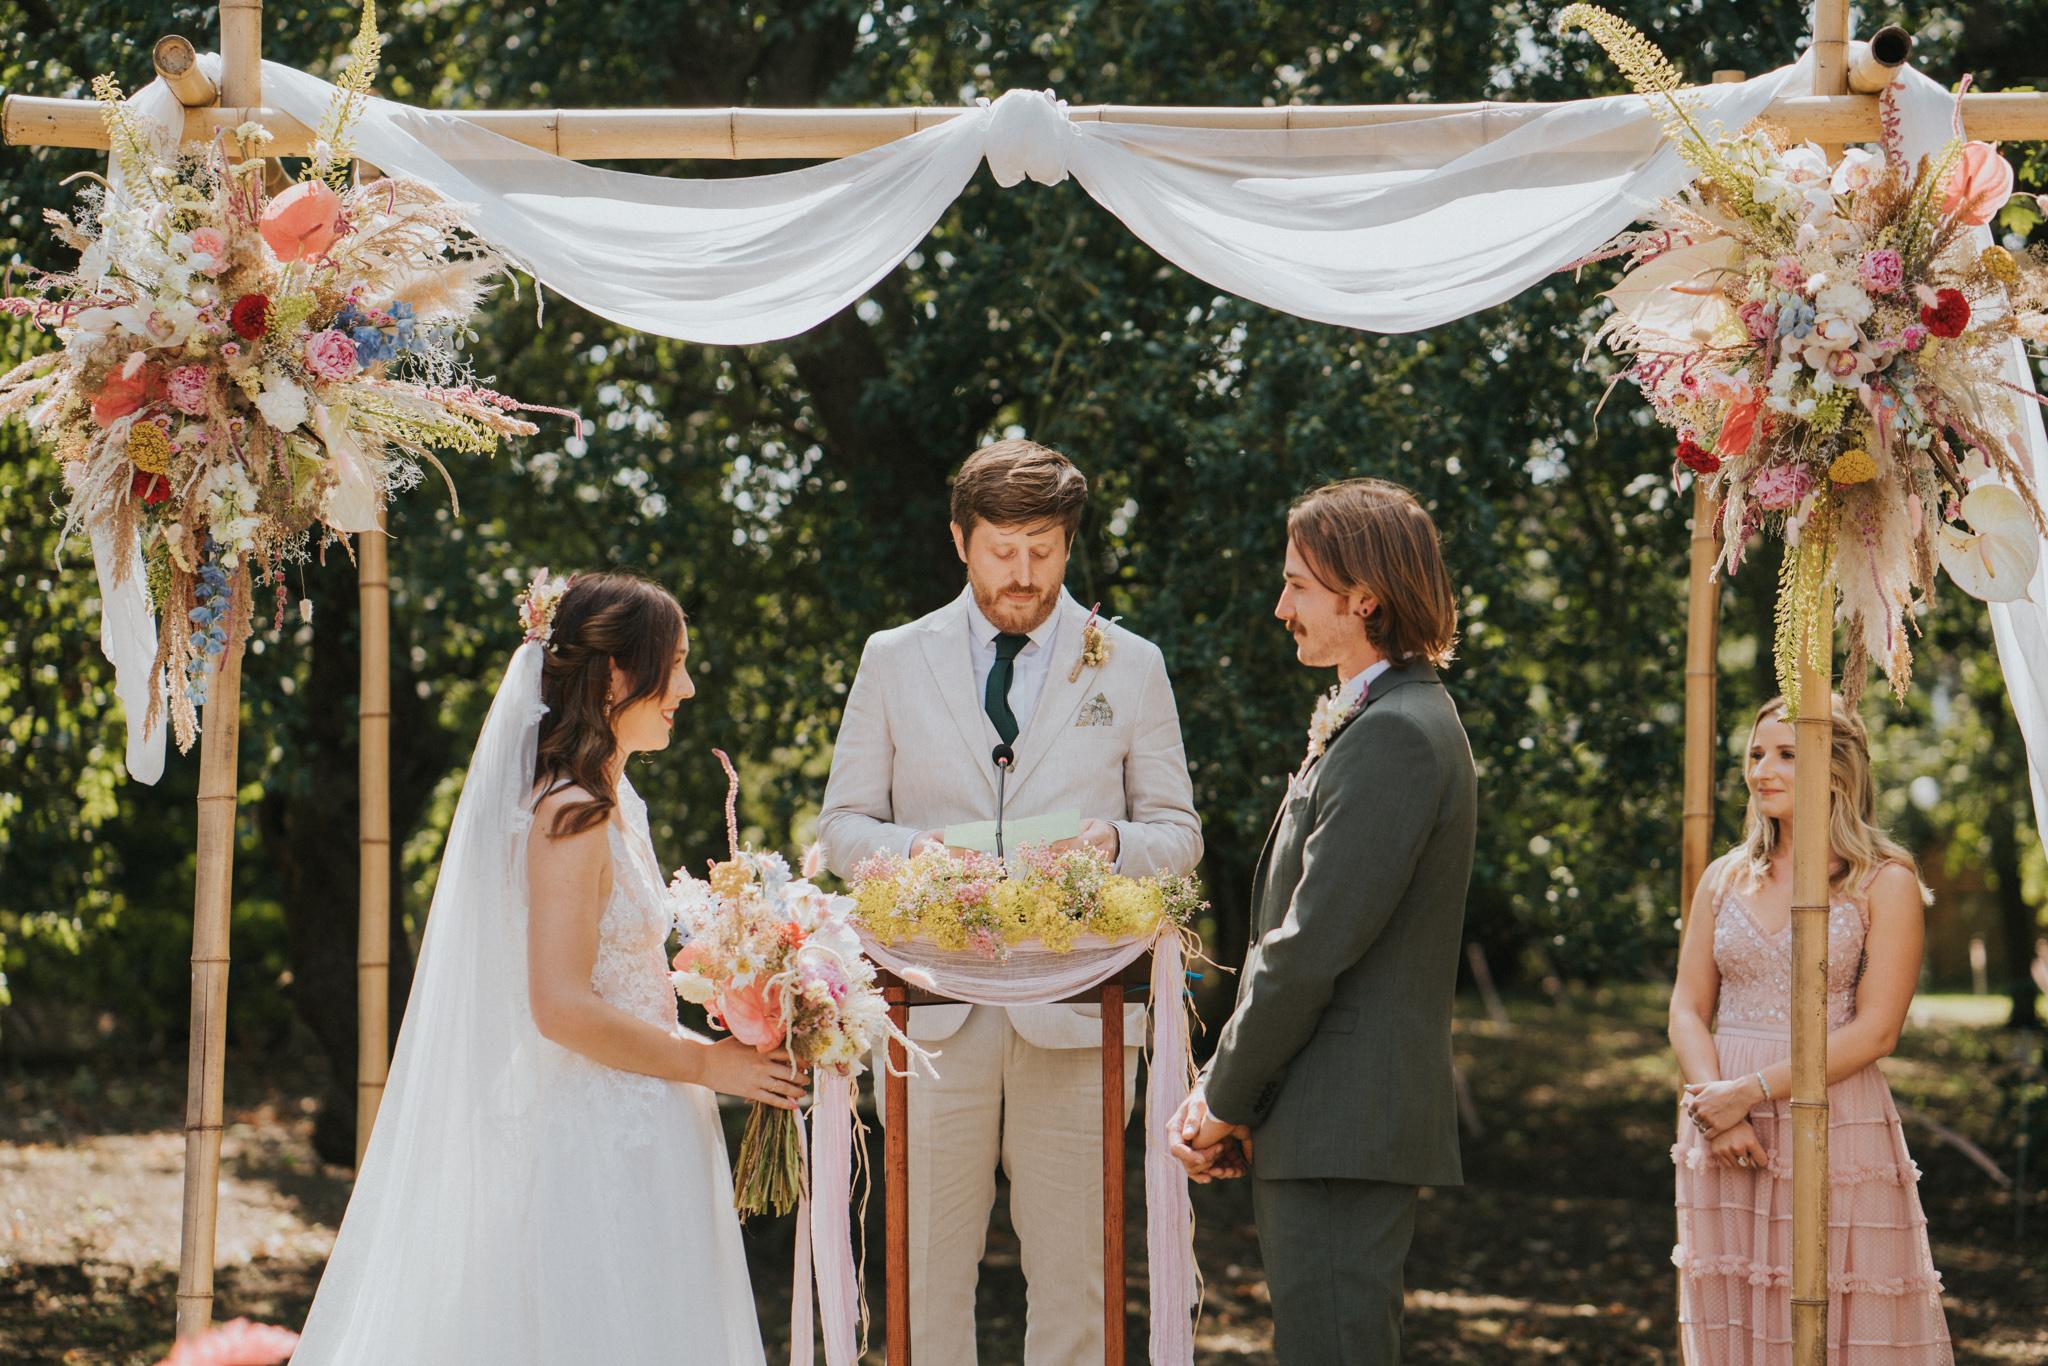 emi-Jack-boho-diy-wedding-eggington-house-grace-elizabeth-colchester-essex-alternative-wedding-photographer-suffolk-norfolk-devon (15 of 56).jpg